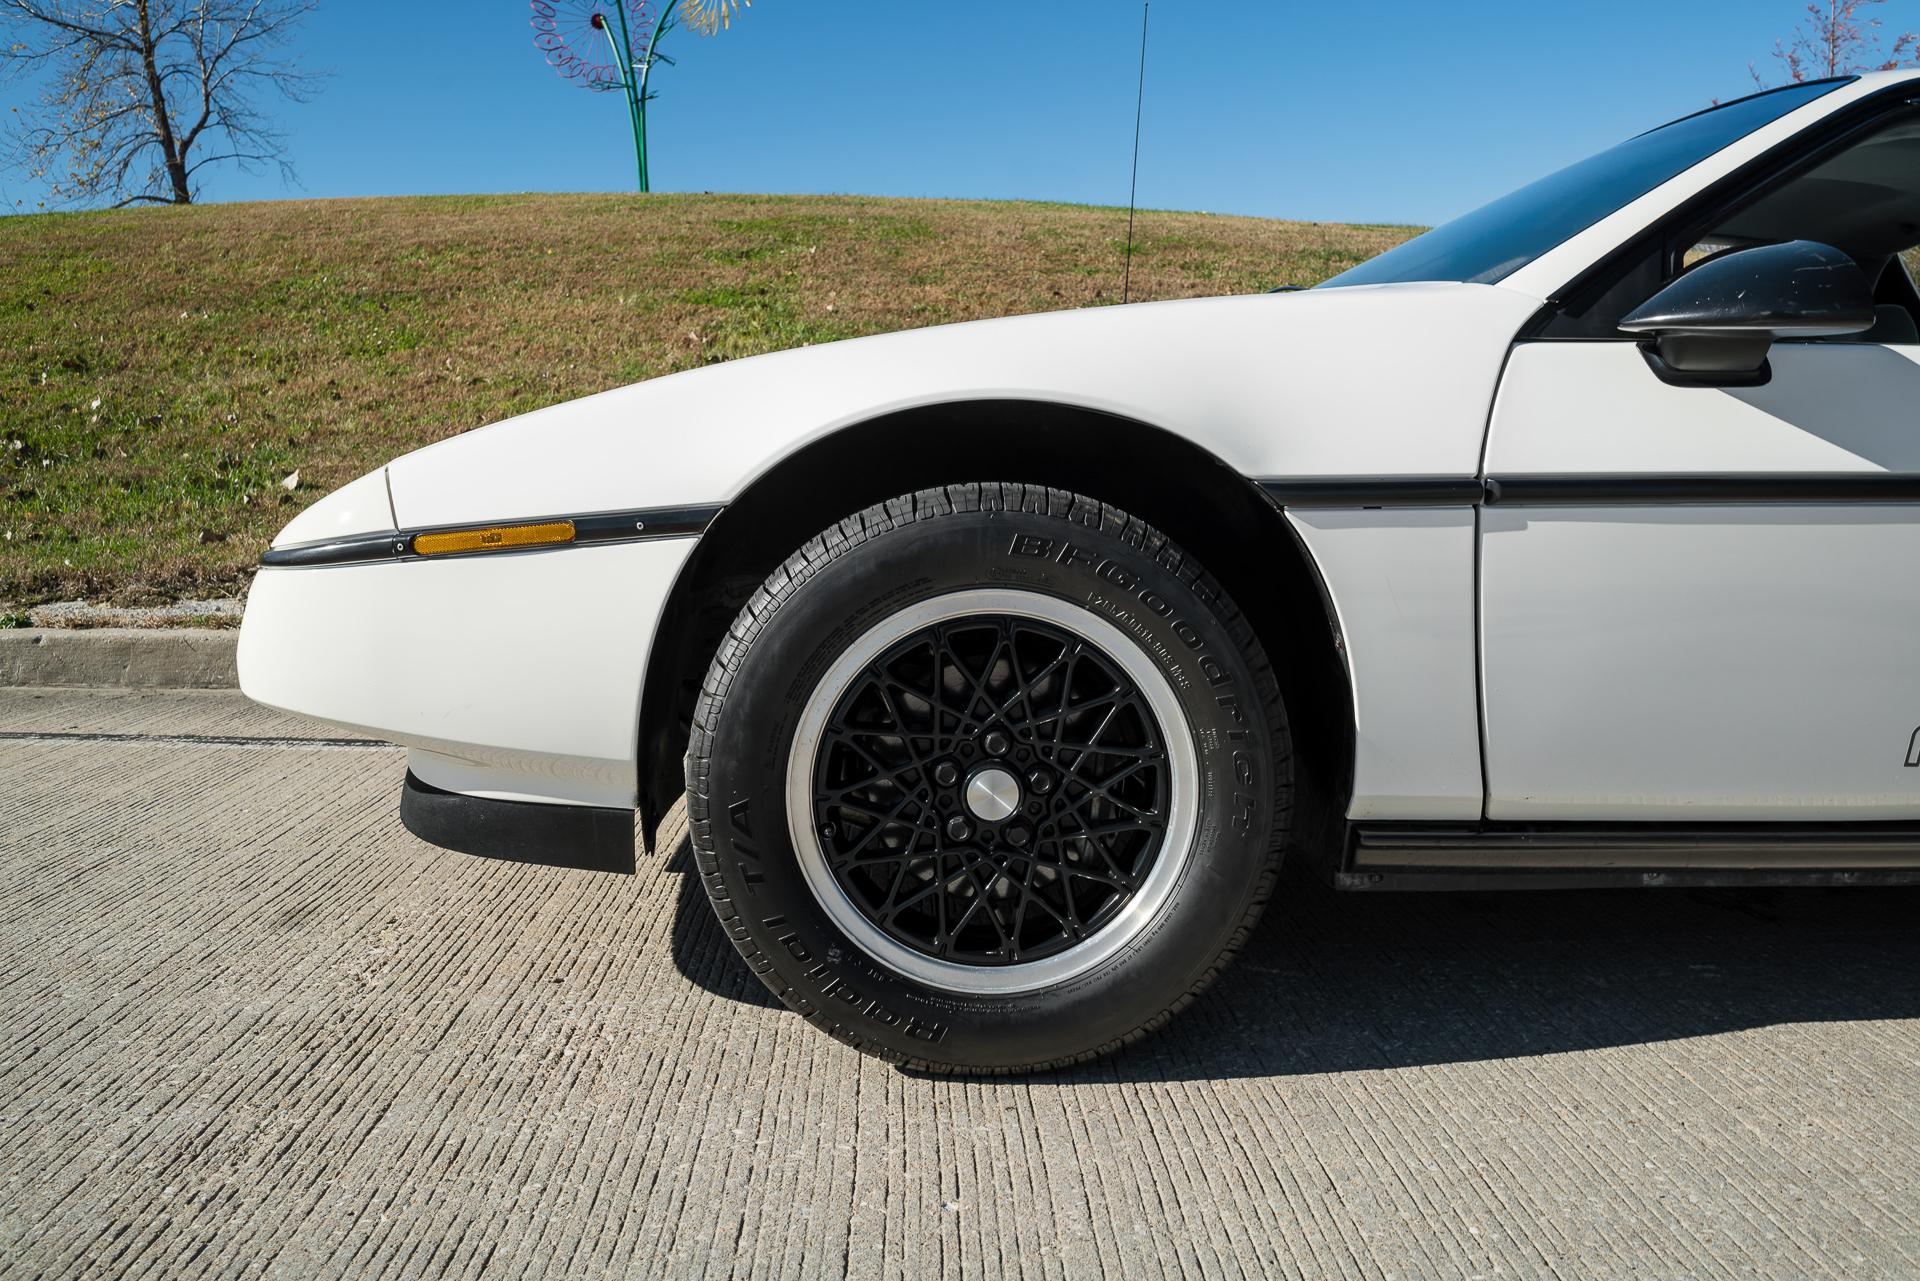 1988 Pontiac Fiero Fast Lane Classic Cars Drivetrain